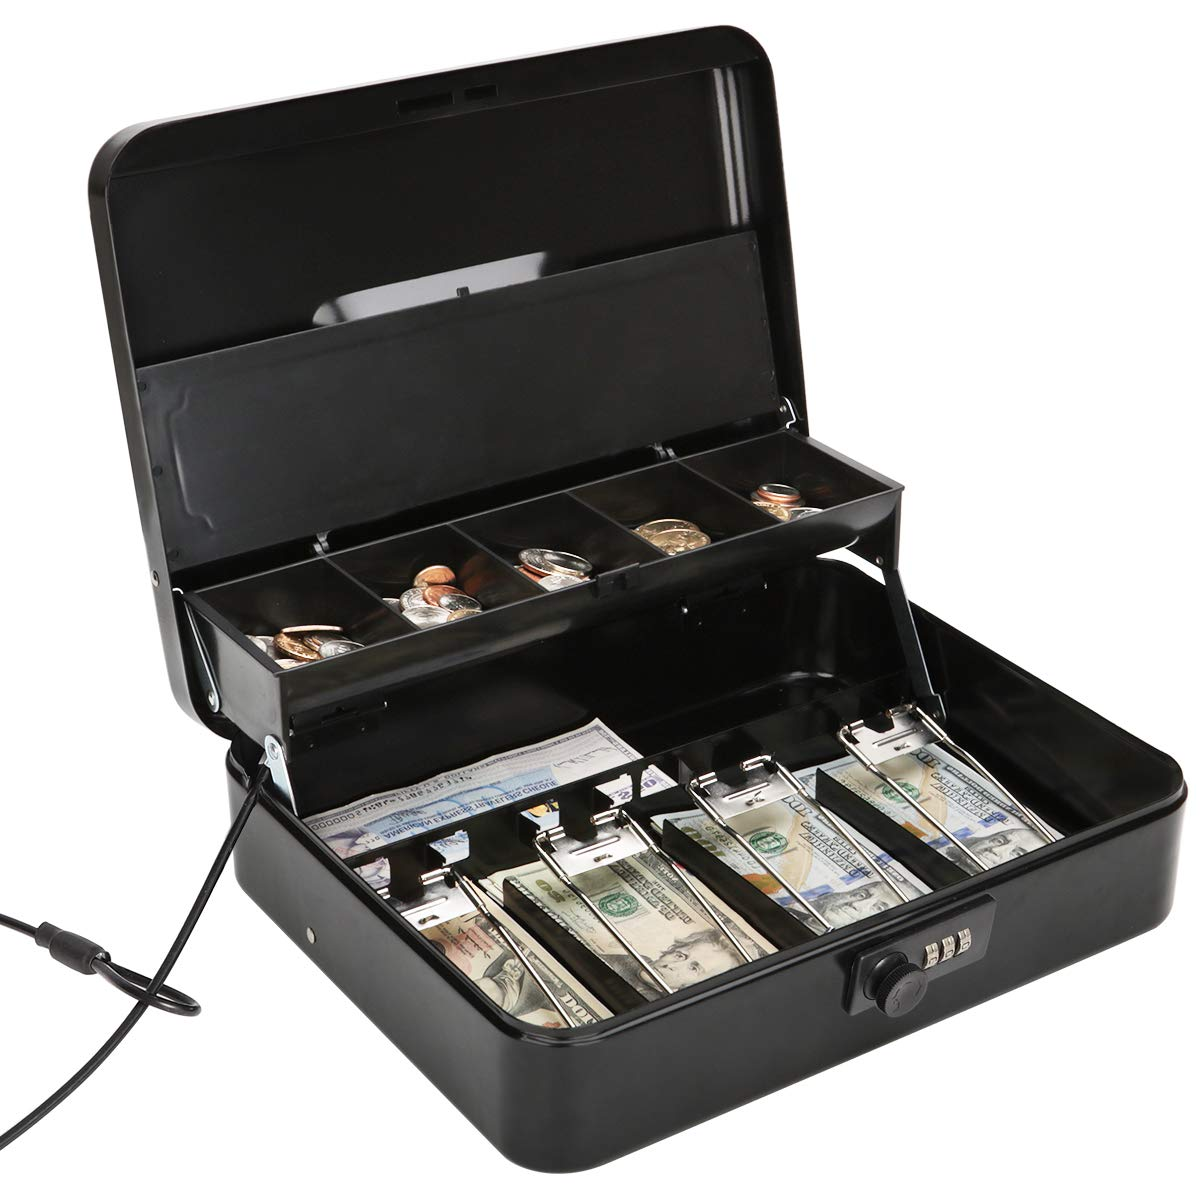 Jssmst Large Locking Cash Box with Money Tray, Metal Money Box with Combination Lock, Black, SM-CB02302XL